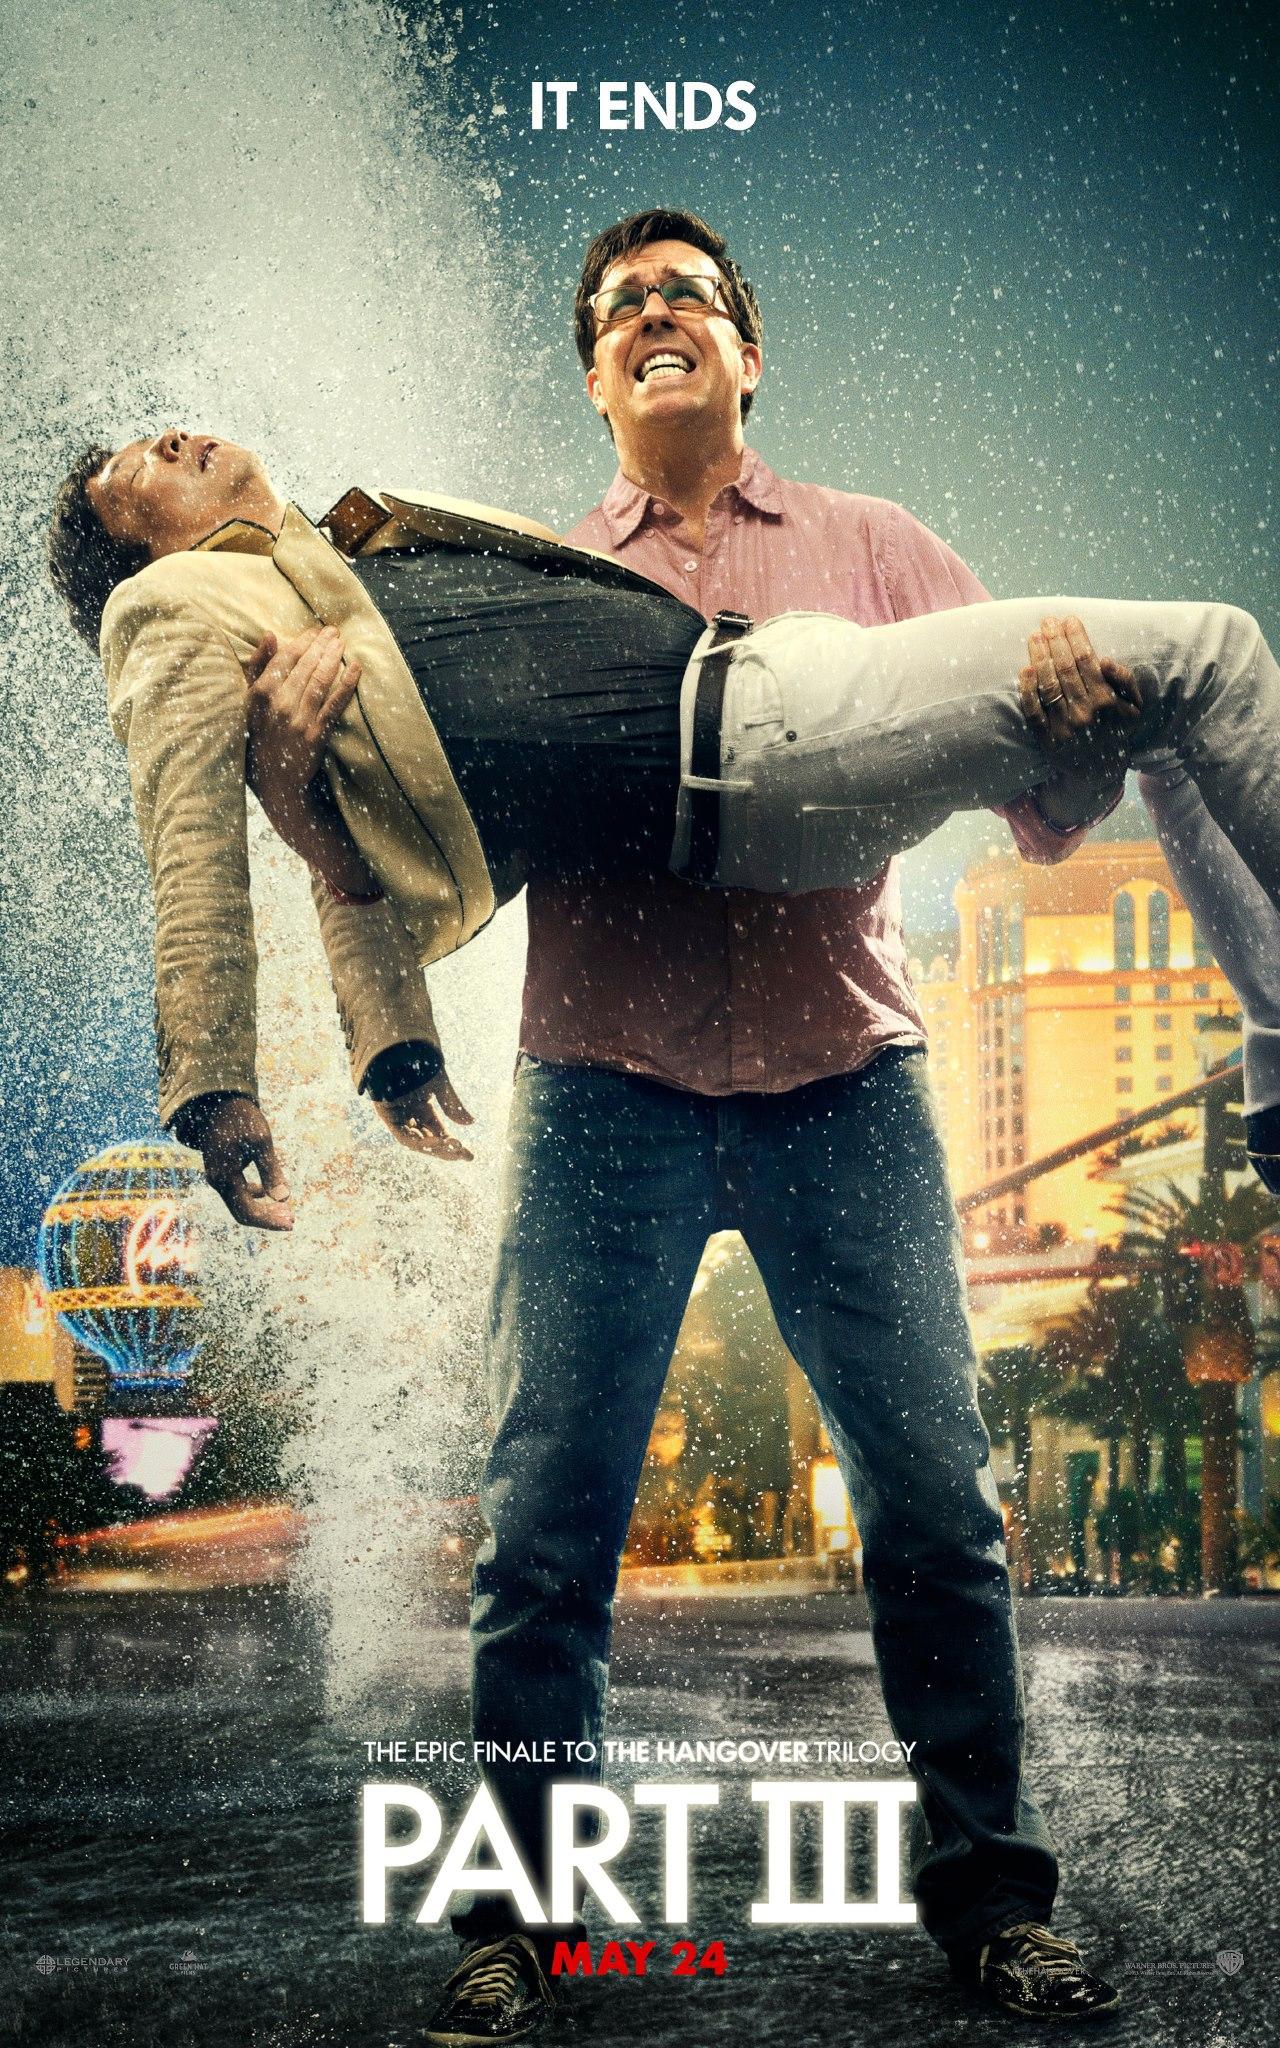 The Hangover Part III - Movie Poster #5 (Original)